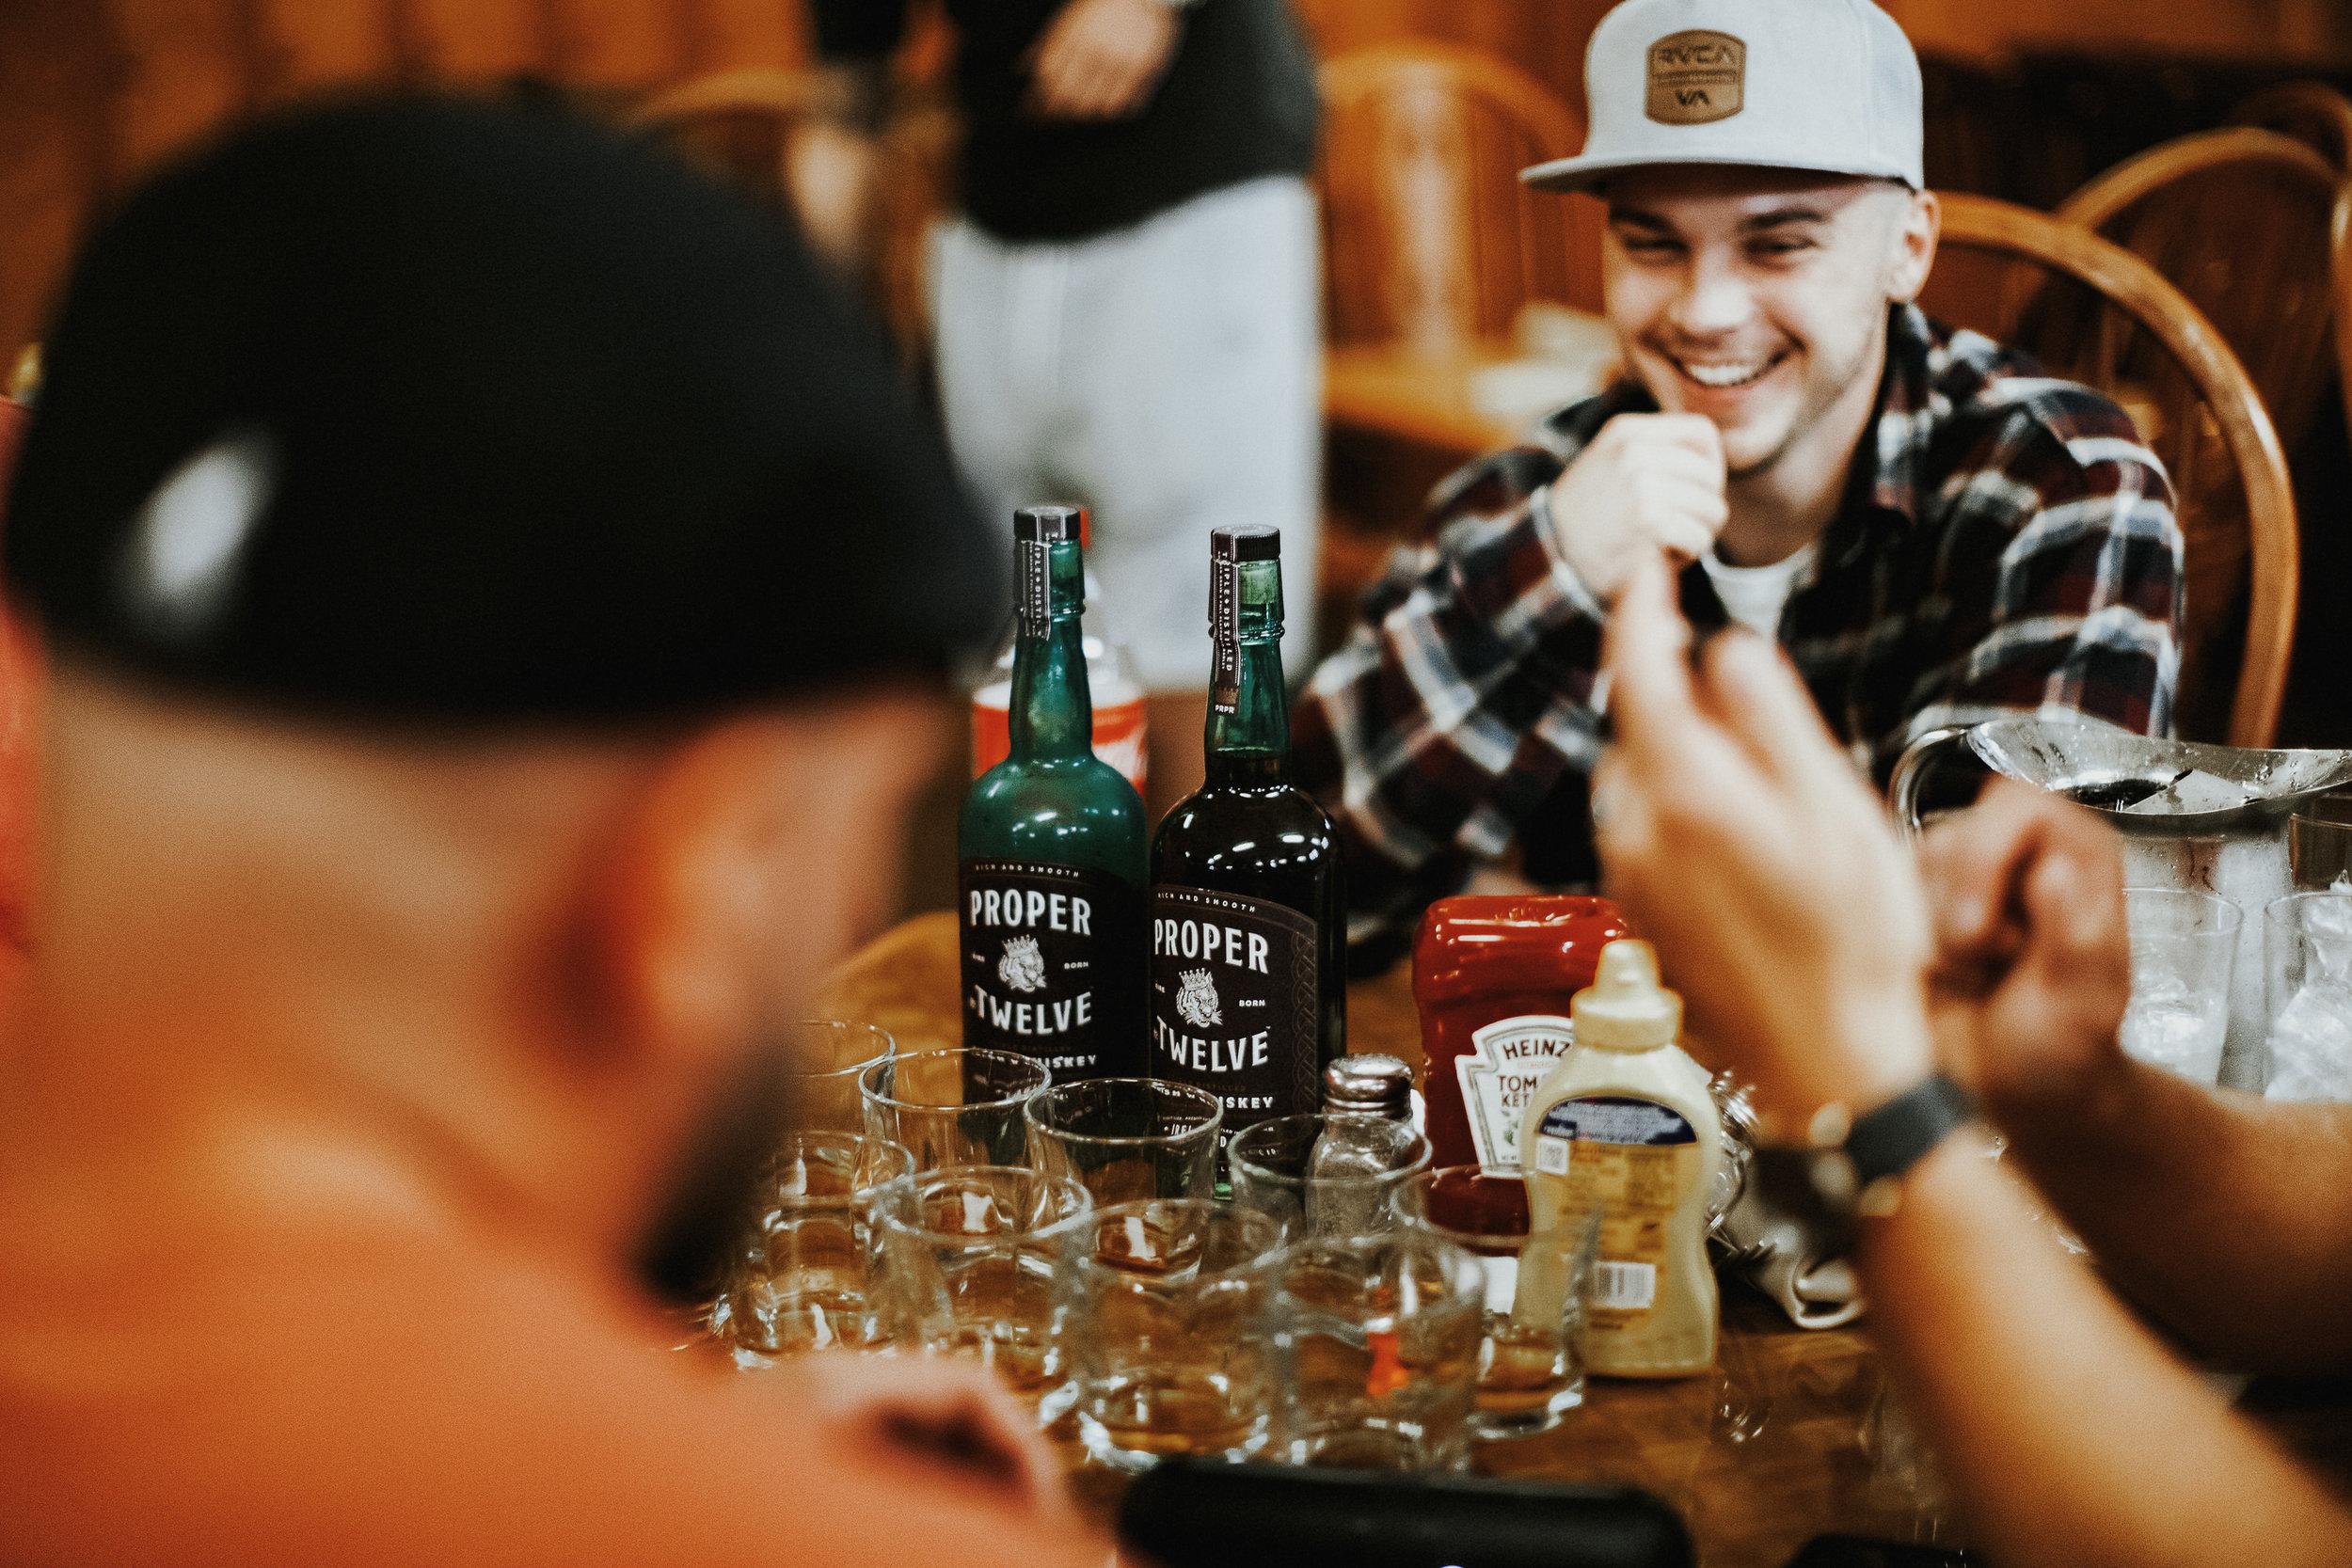 shots on shots, they love proper twelve